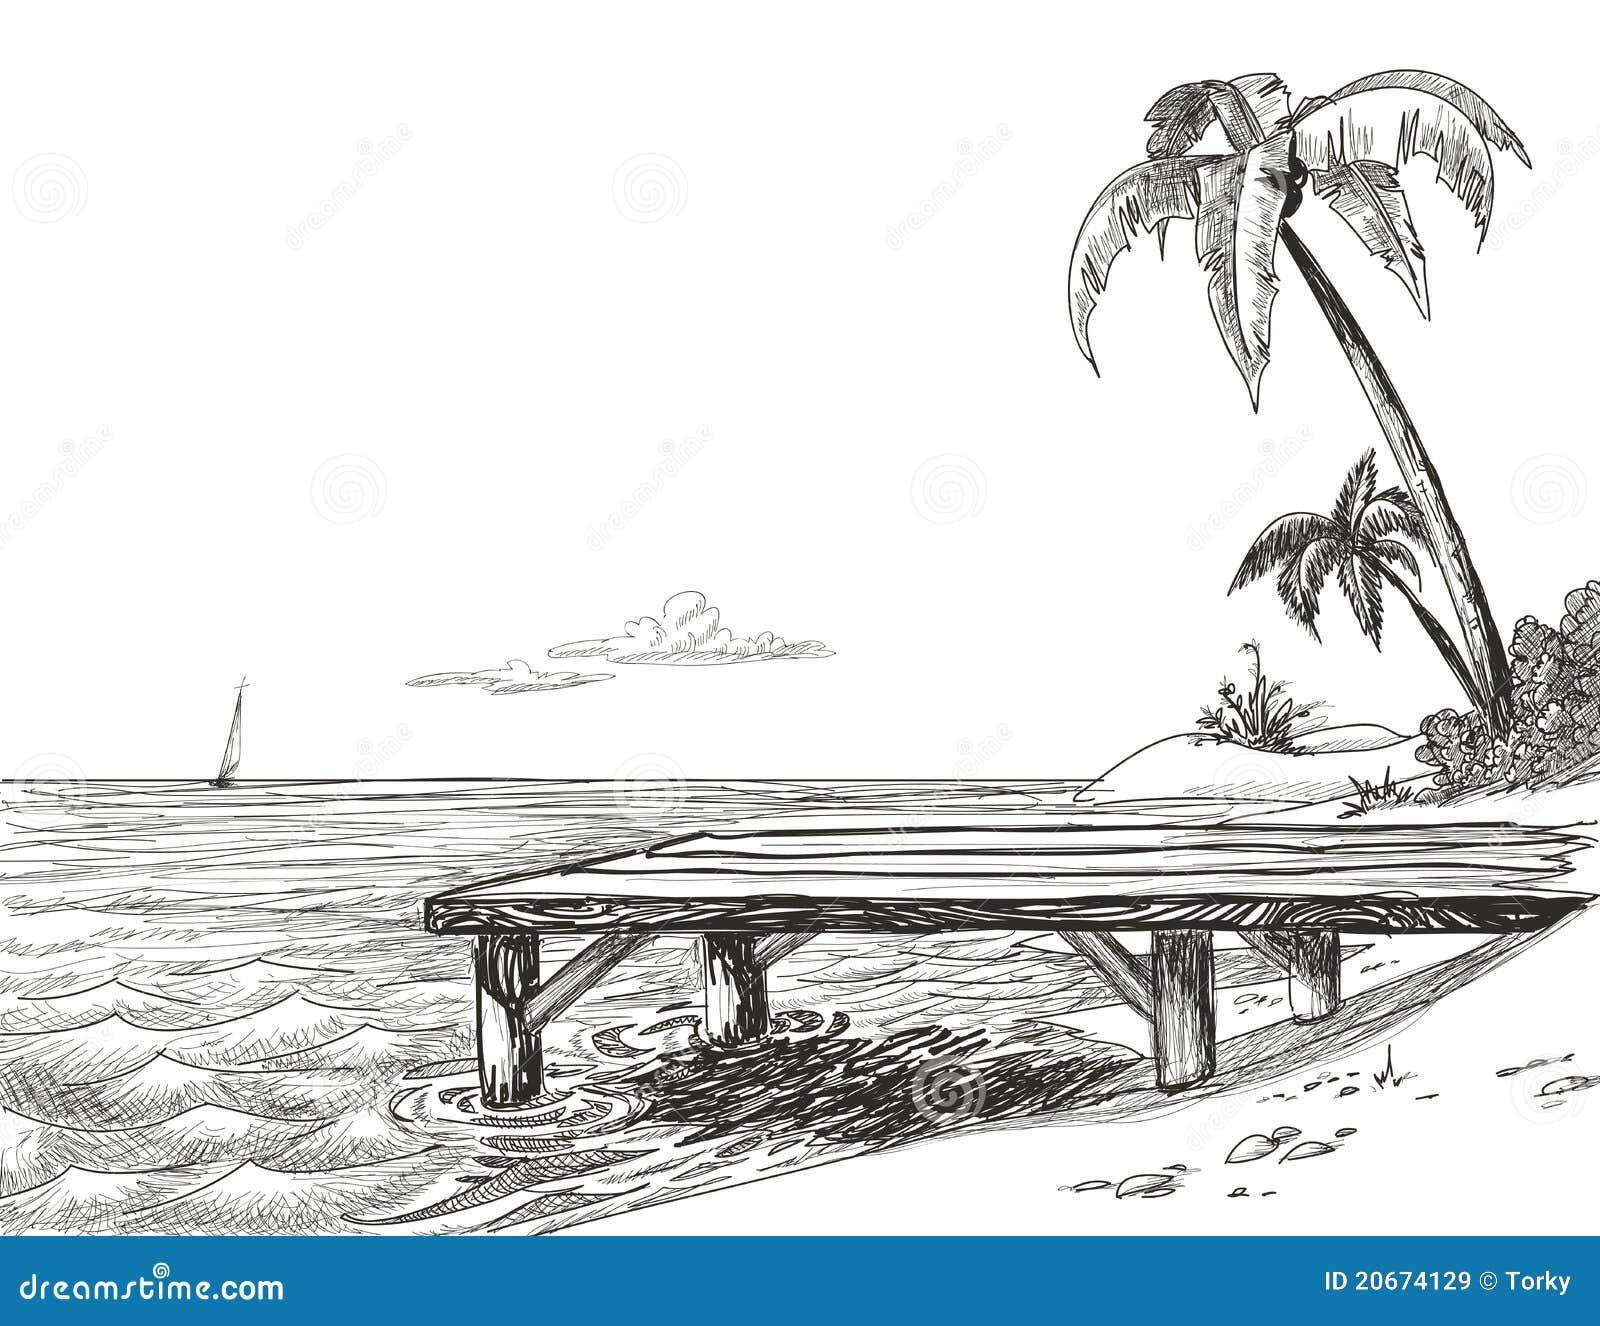 Beach Pencil Drawing